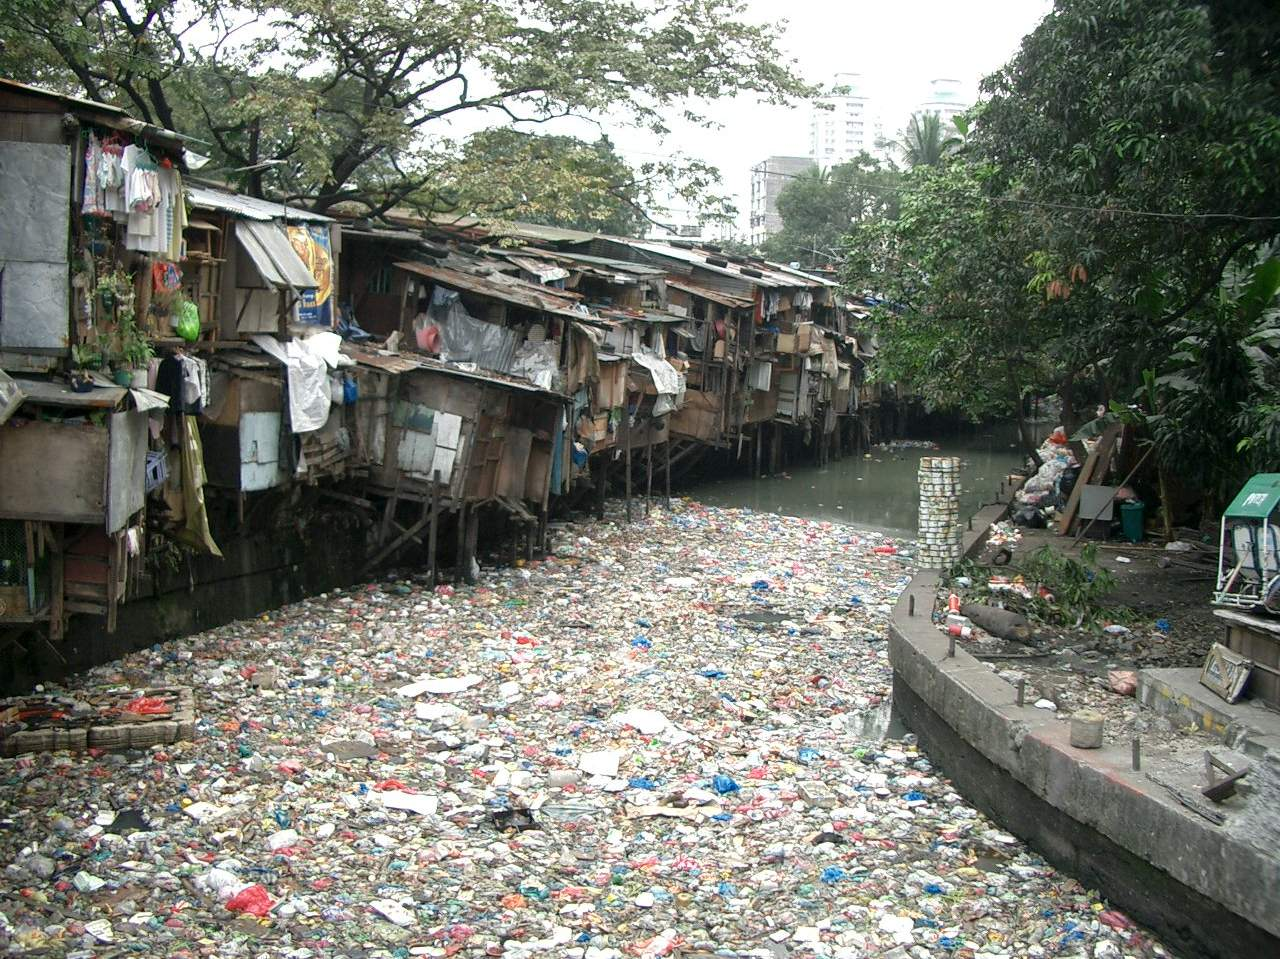 369%20%20Tondo - The World of Tondo, Manila - Philippine Photo Gallery